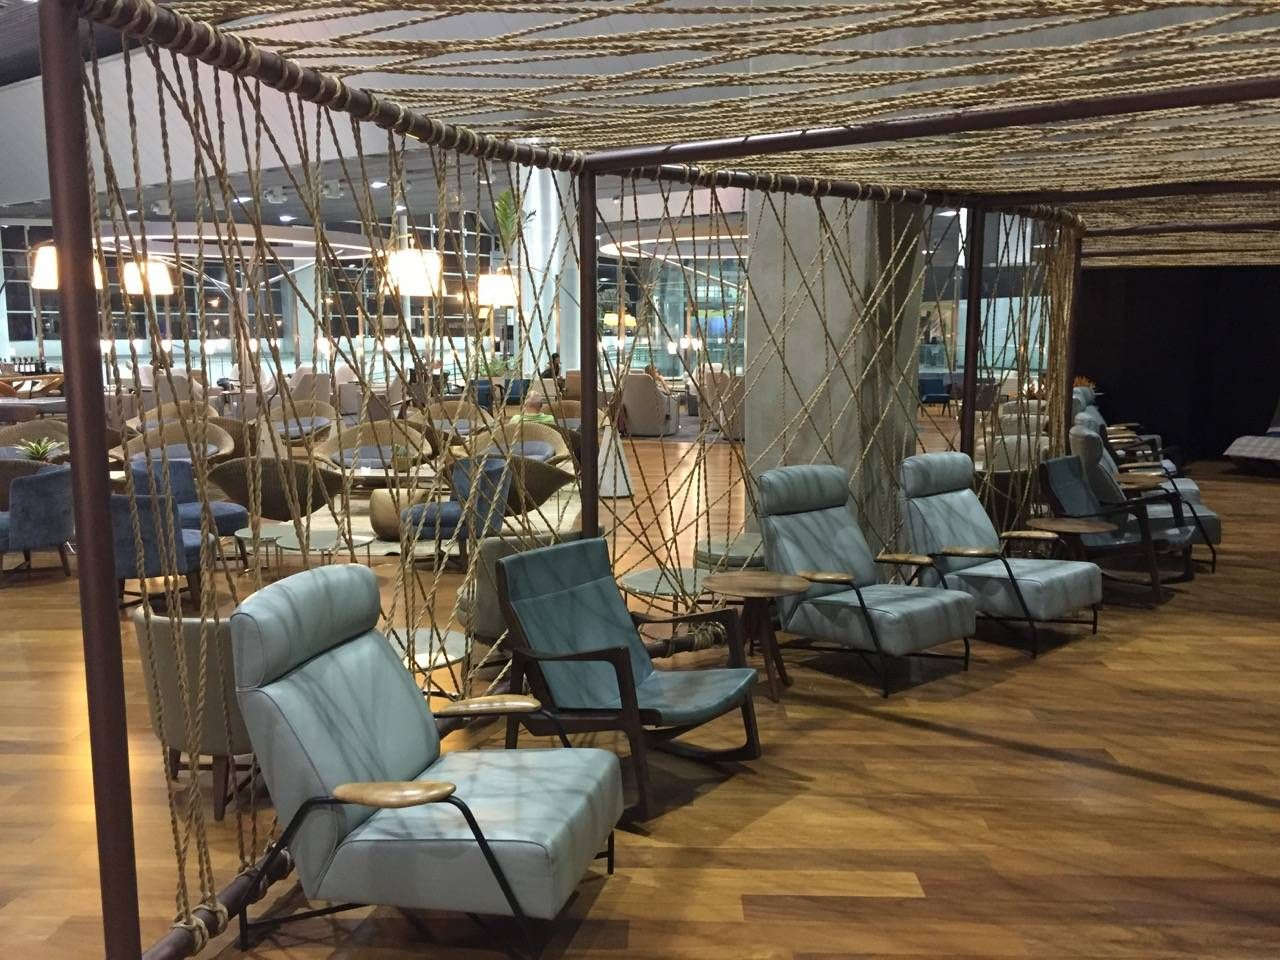 Star Alliance Lounge GRU-019